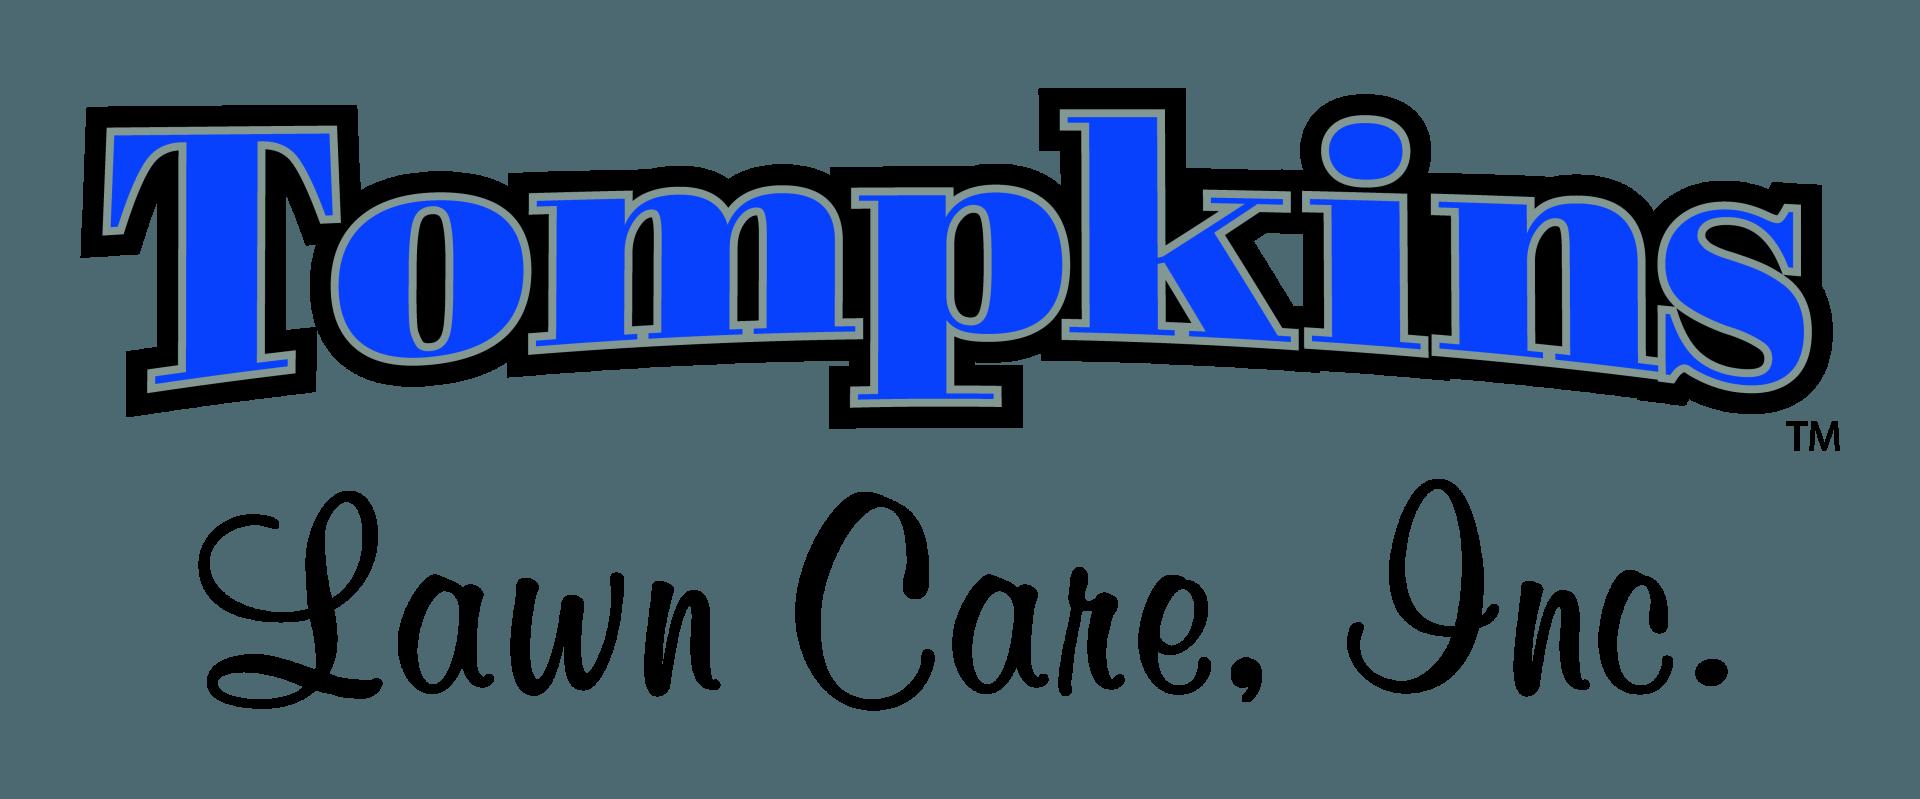 Tompkins Lawn Care Iowa Turf Care